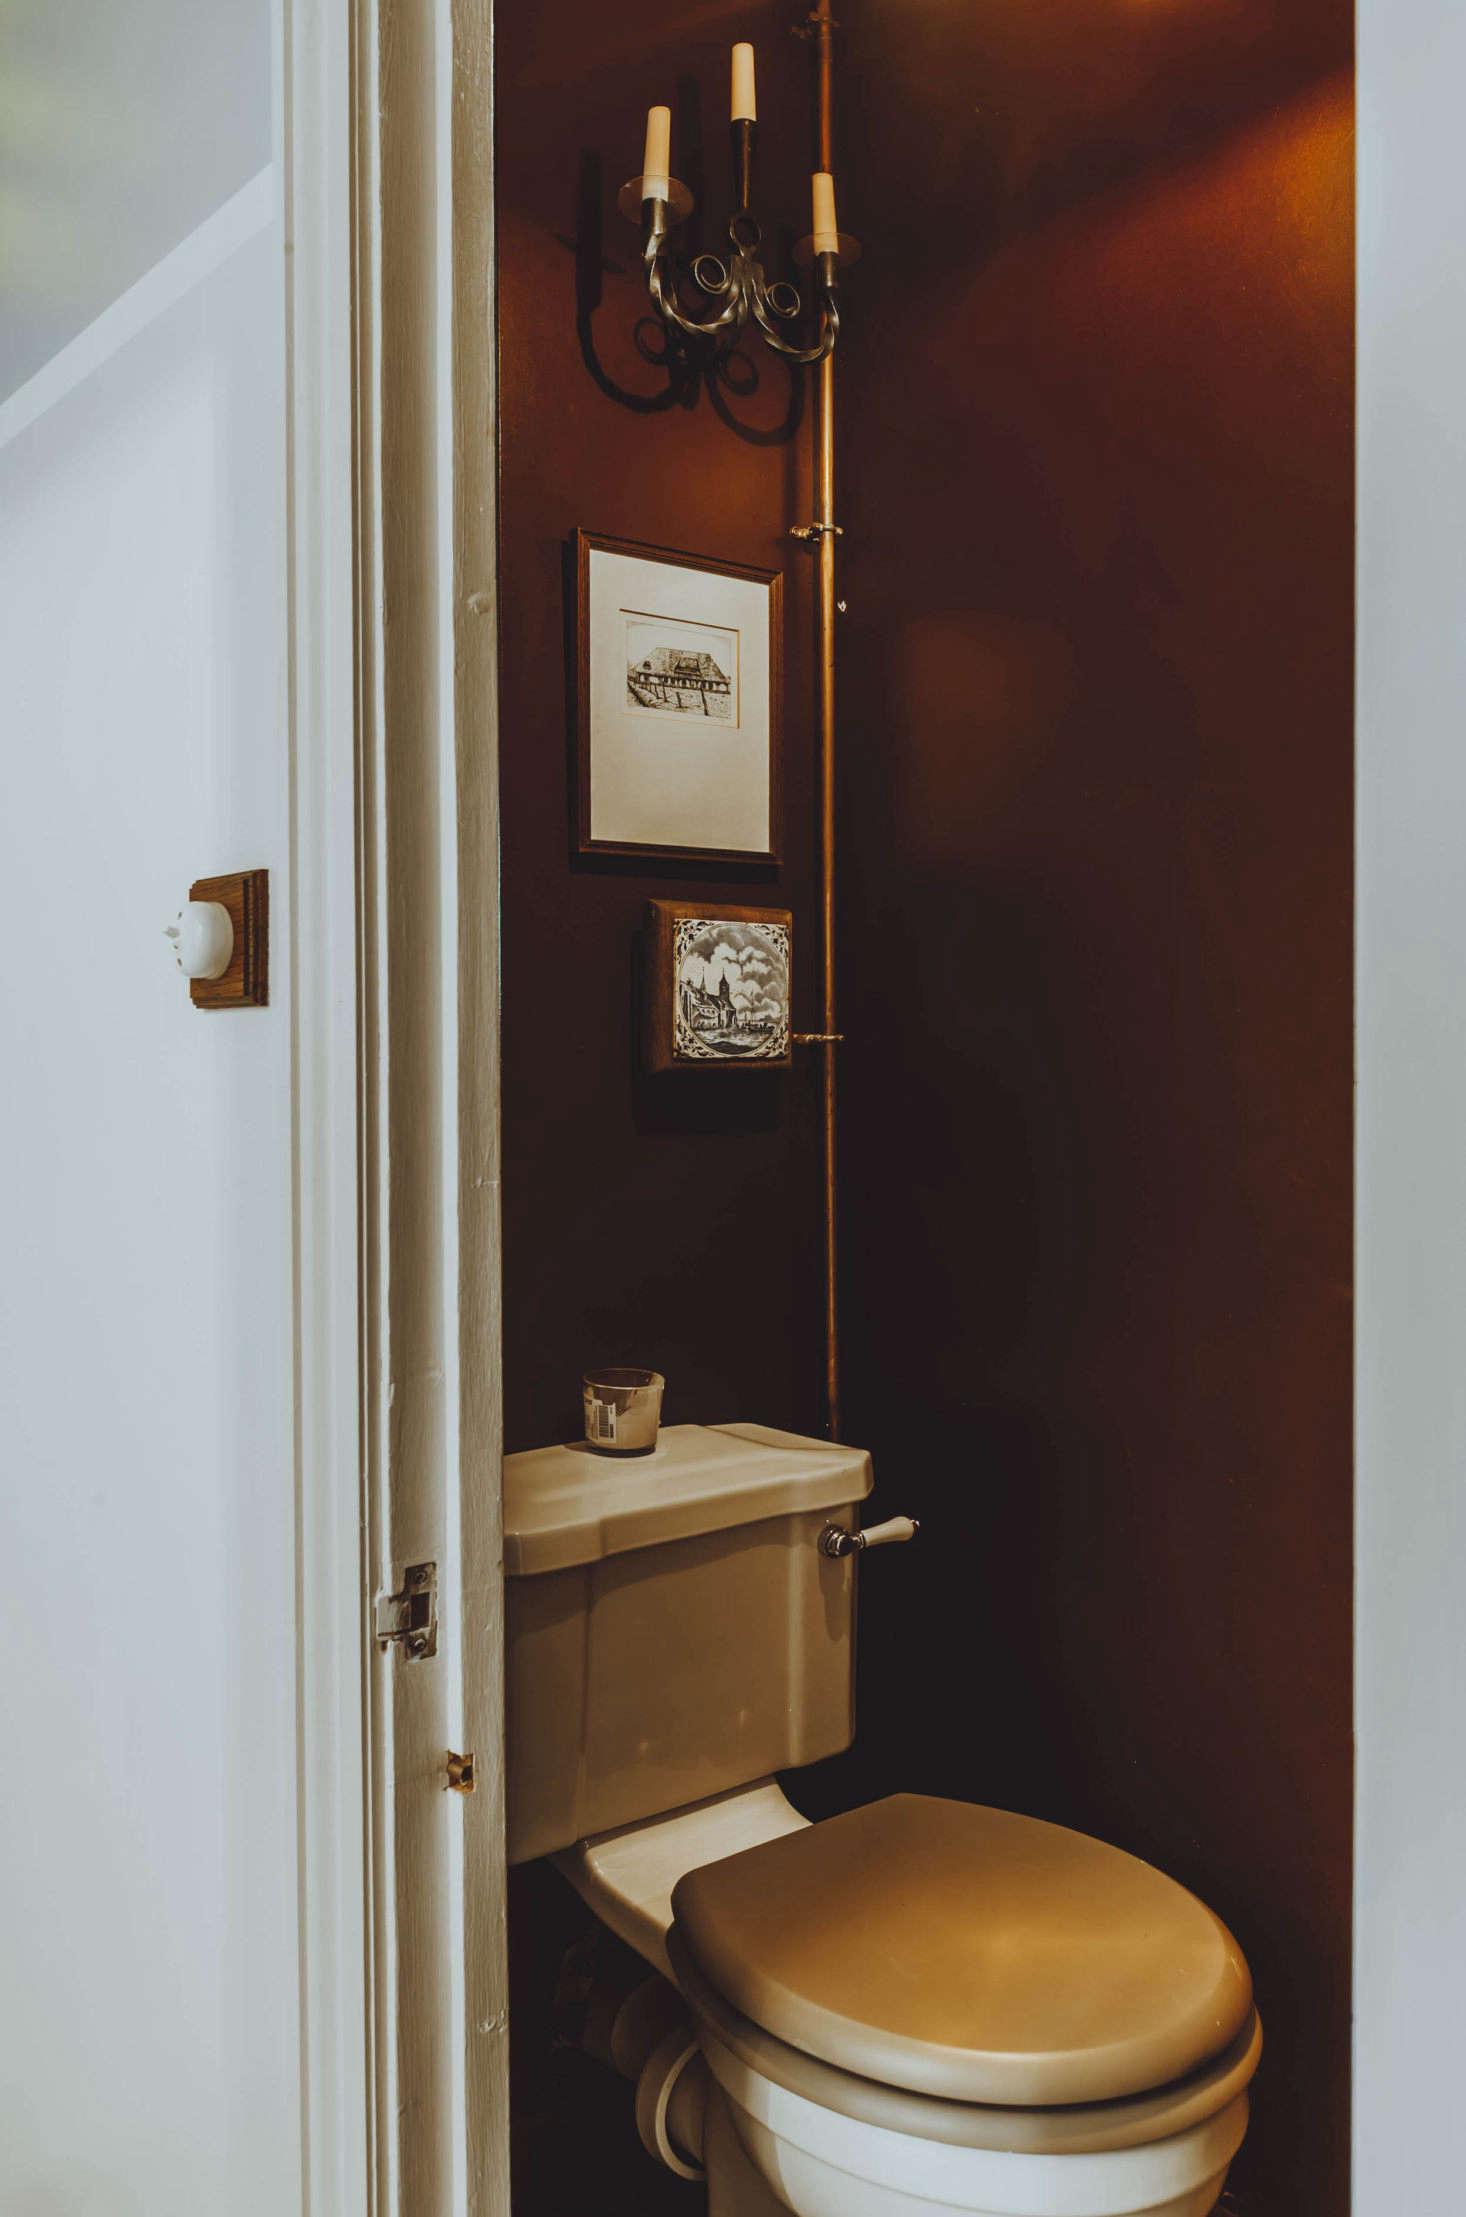 And the auburn-hued powder room. &#8